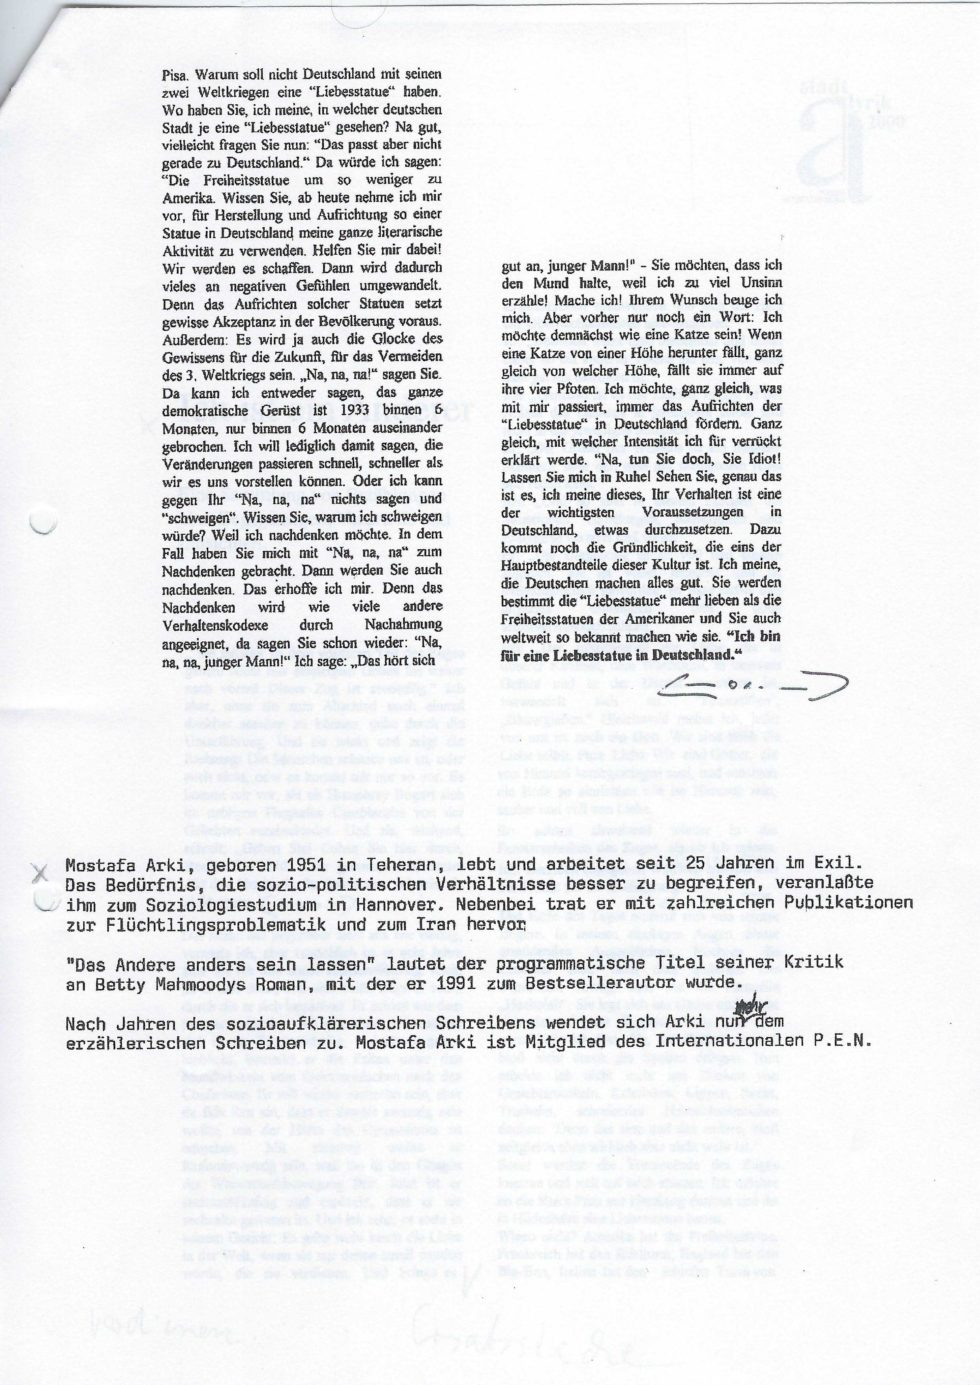 Säulen_Texte_Seite_12